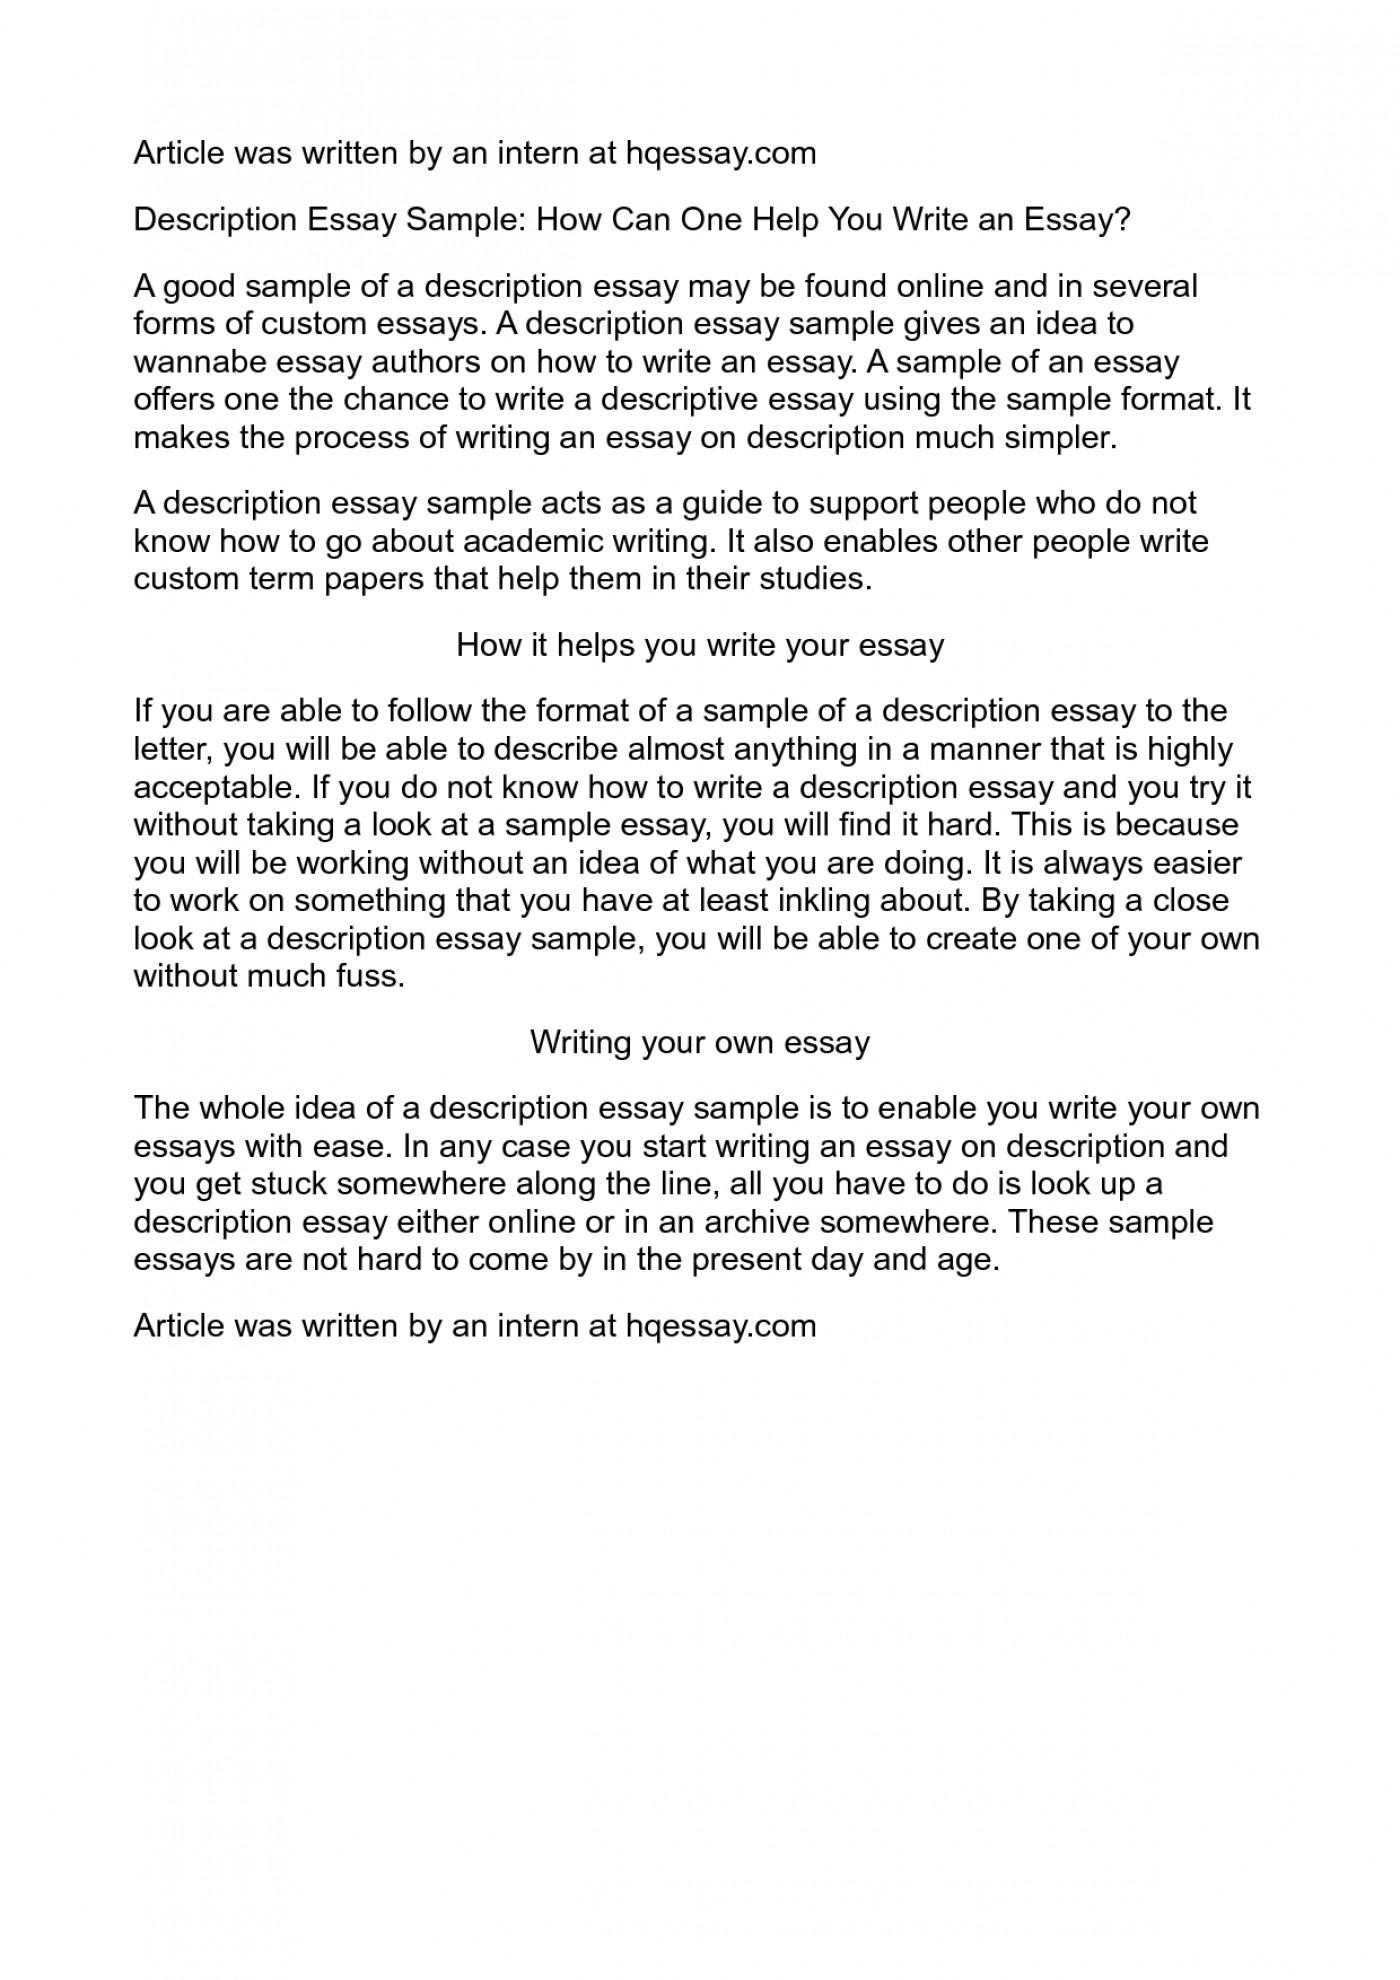 Essay help the environment